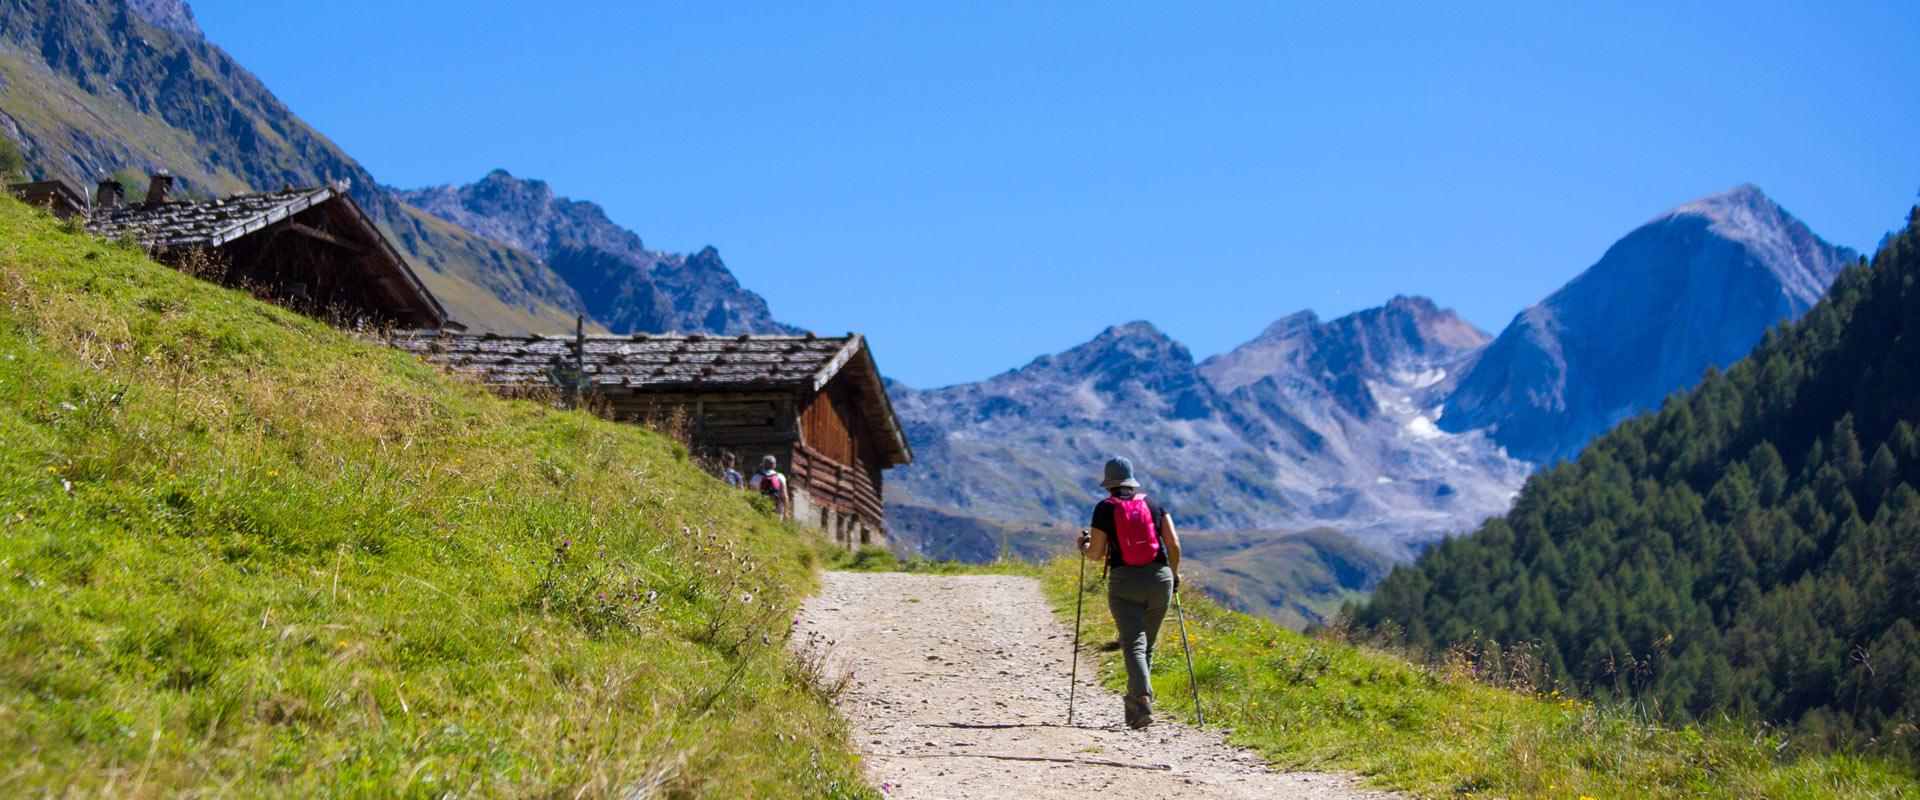 Wanderparadies Schnalstal